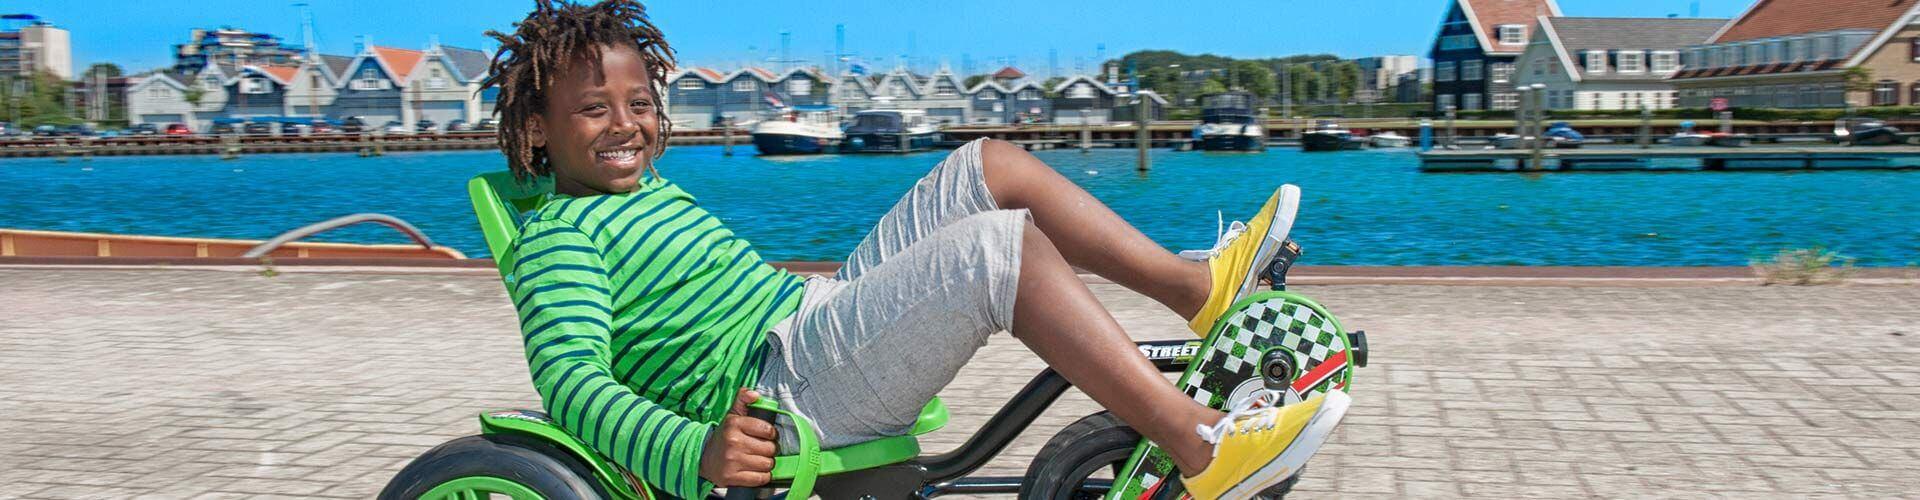 Balance Bike Triker günstig kaufen bei gokart-profi.de